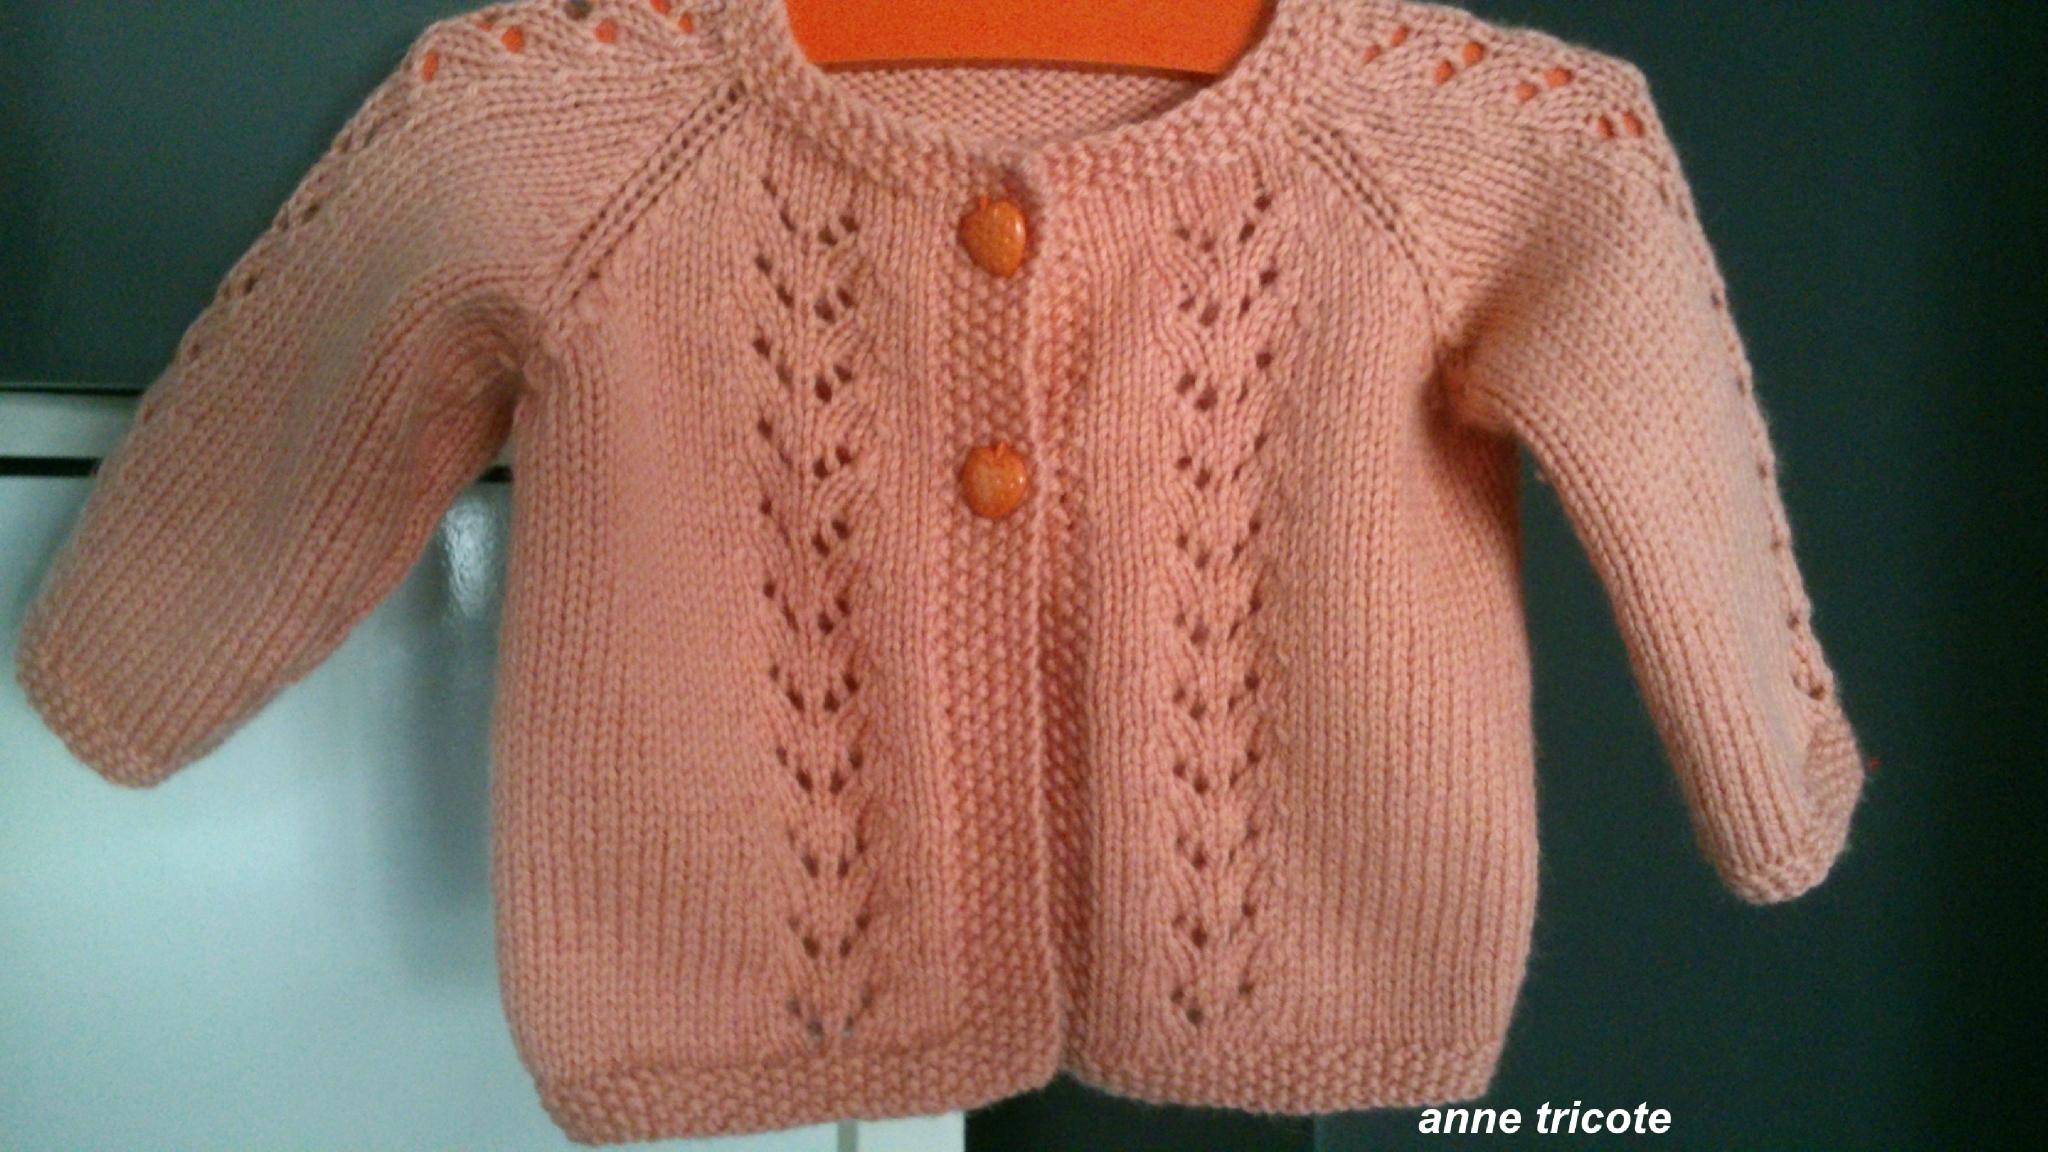 Tricoter gilet fille